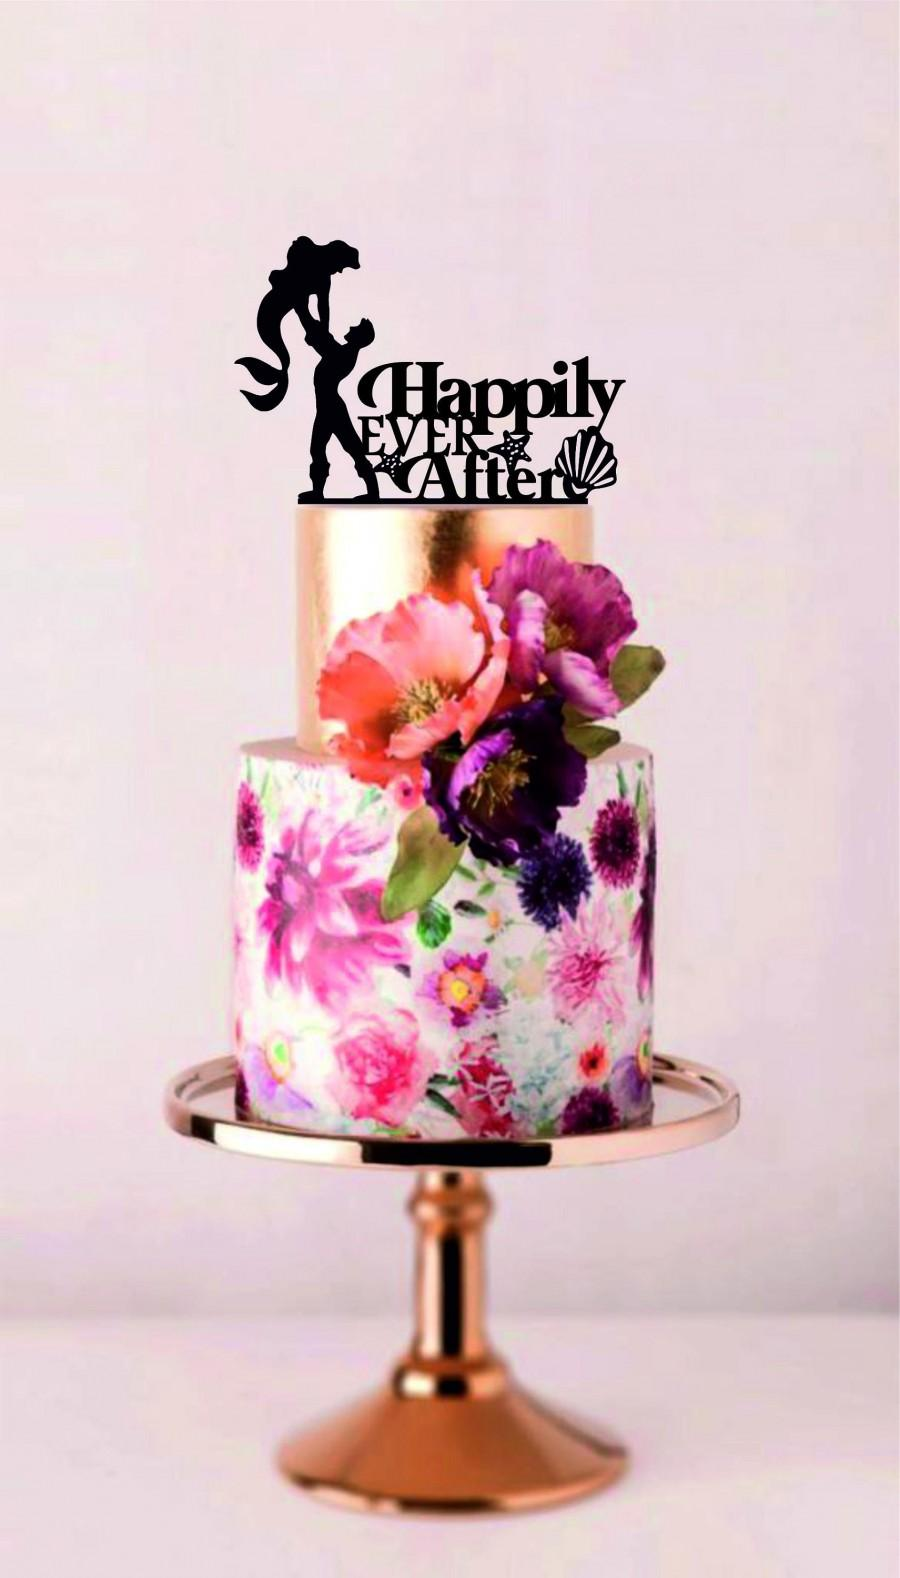 زفاف - Prince and Mermaid Cake Topper, Mermaid Wedding Cake Topper, Happily Ever After Silhouette Cake Topper, Cake Topper With Words